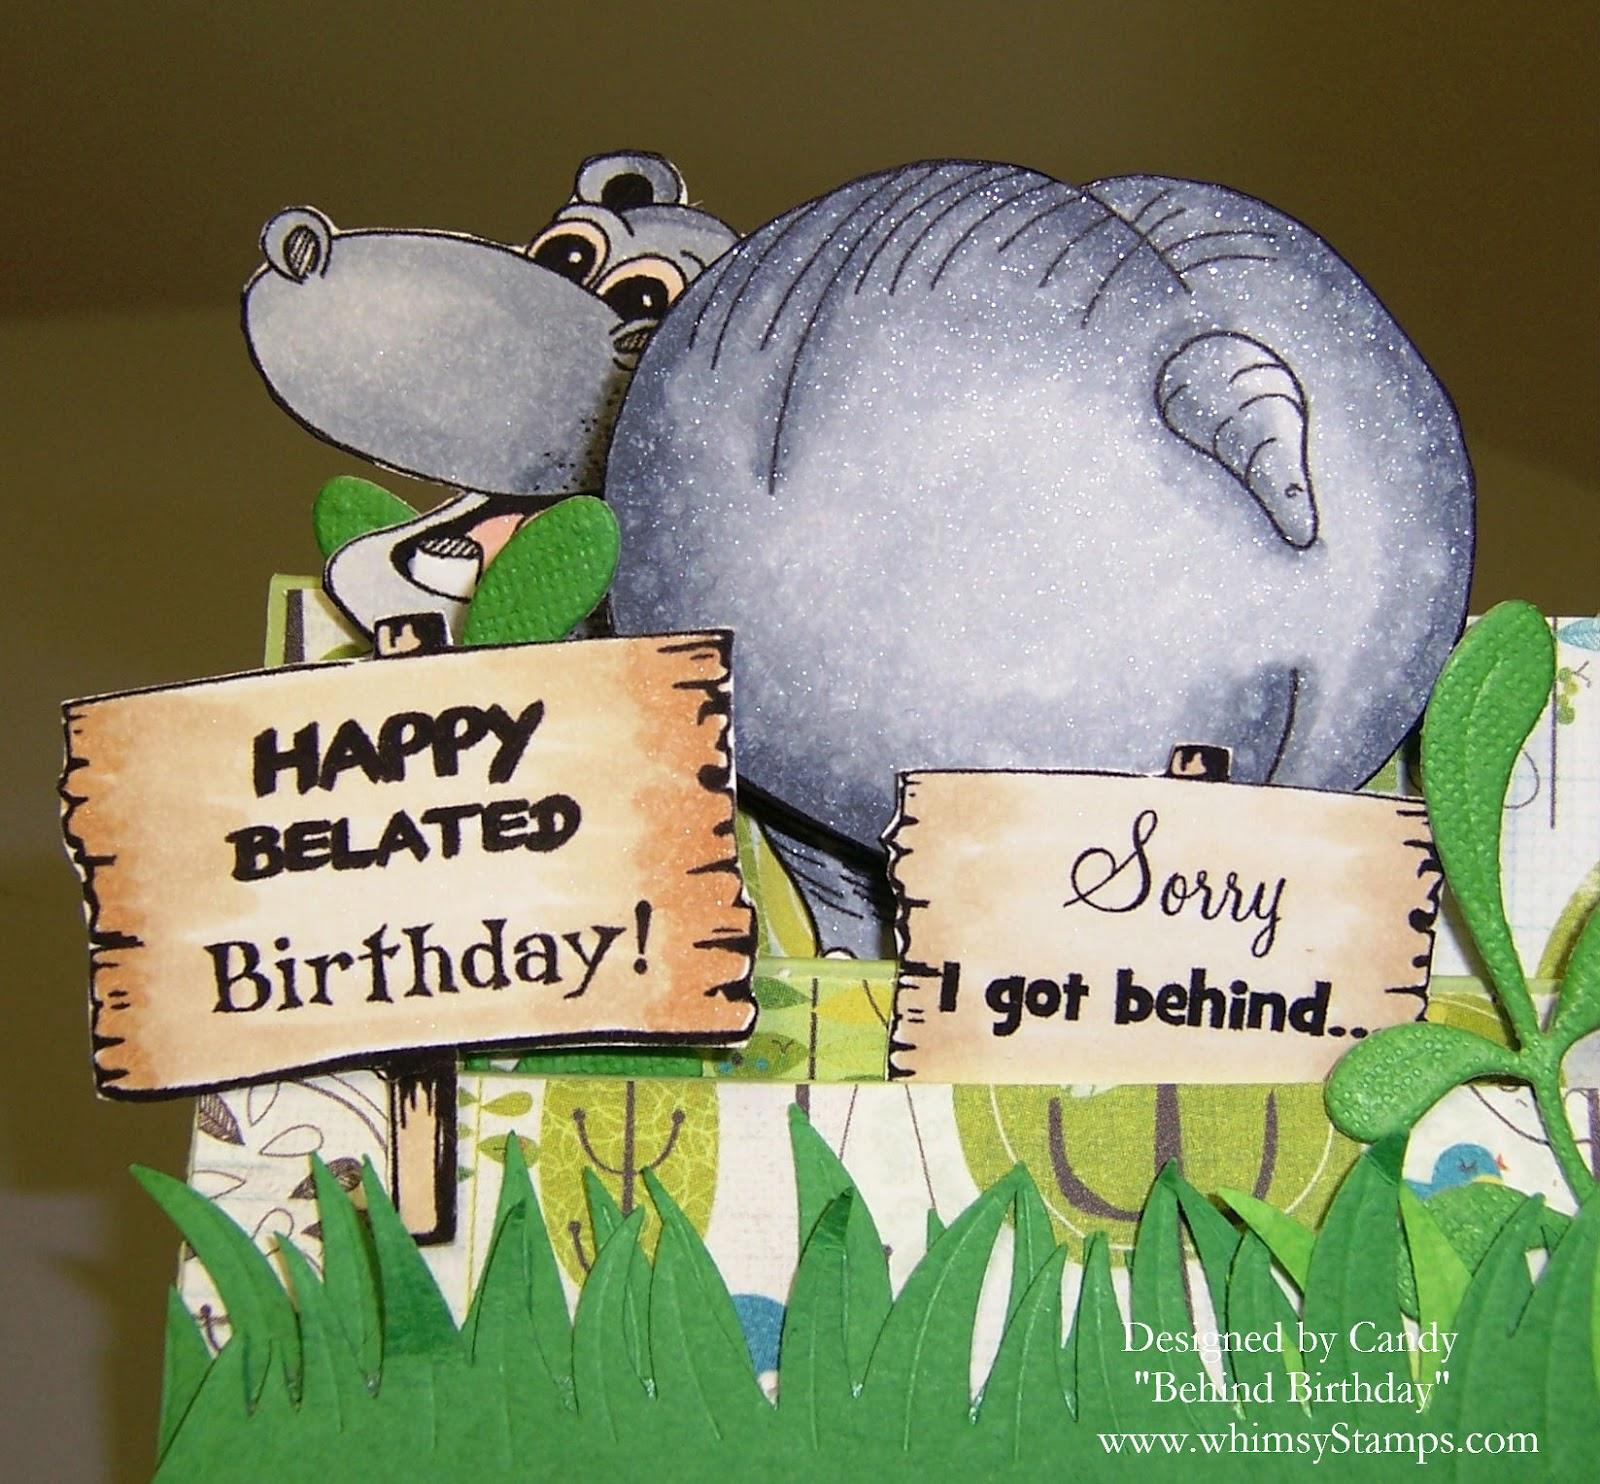 Happy Belated Christian Birthday Wishes Belated birthday wishes